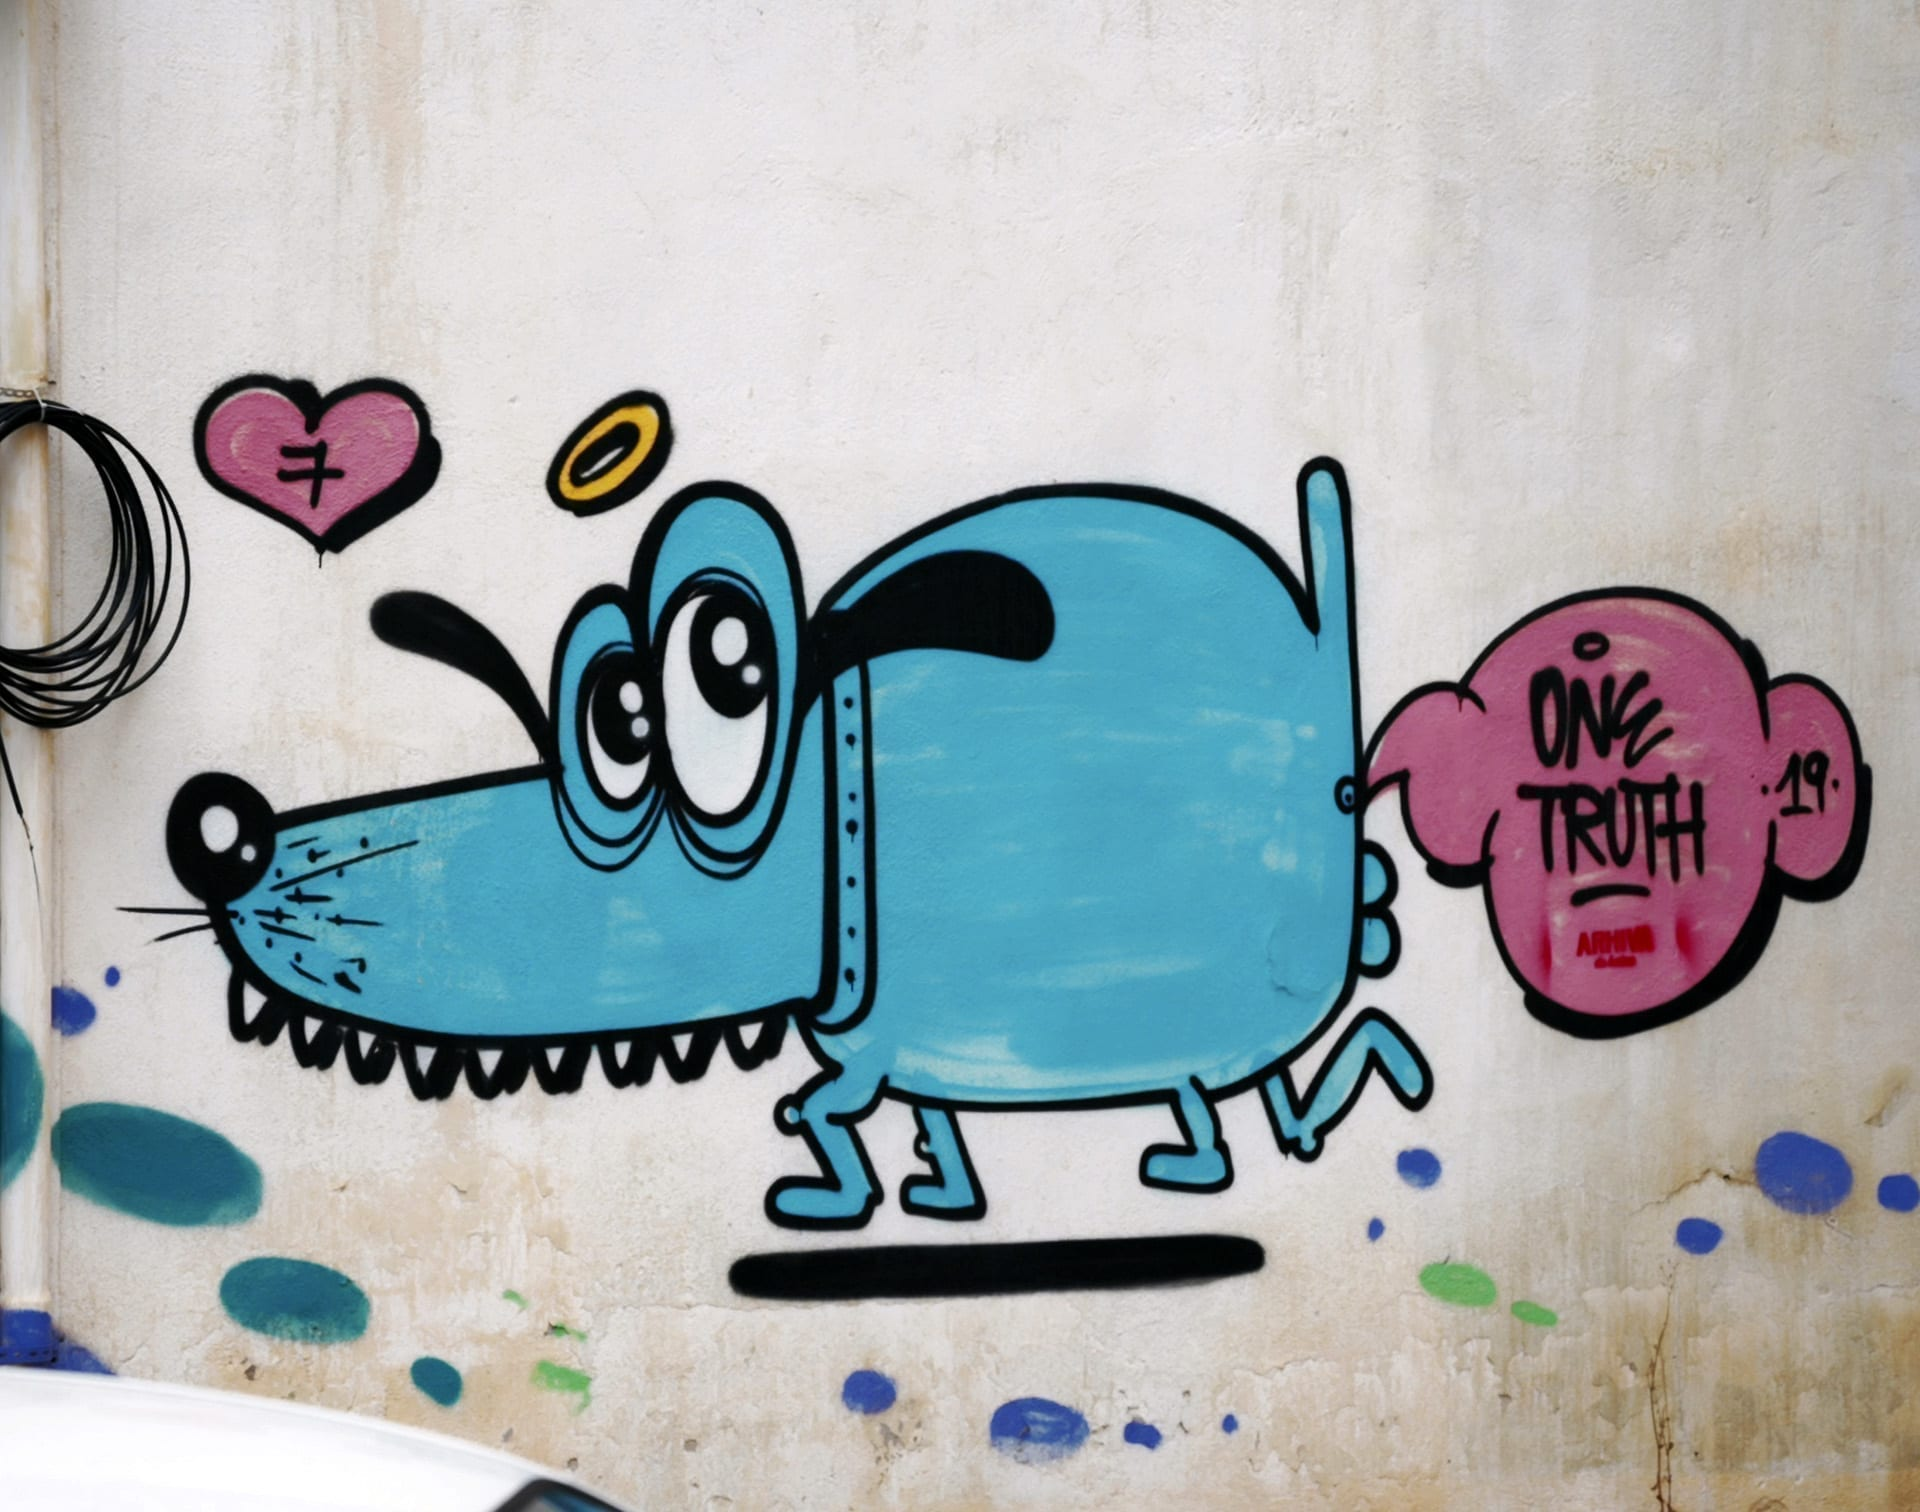 One Truth Graffiti (CH) street dog in Bucharest 2019